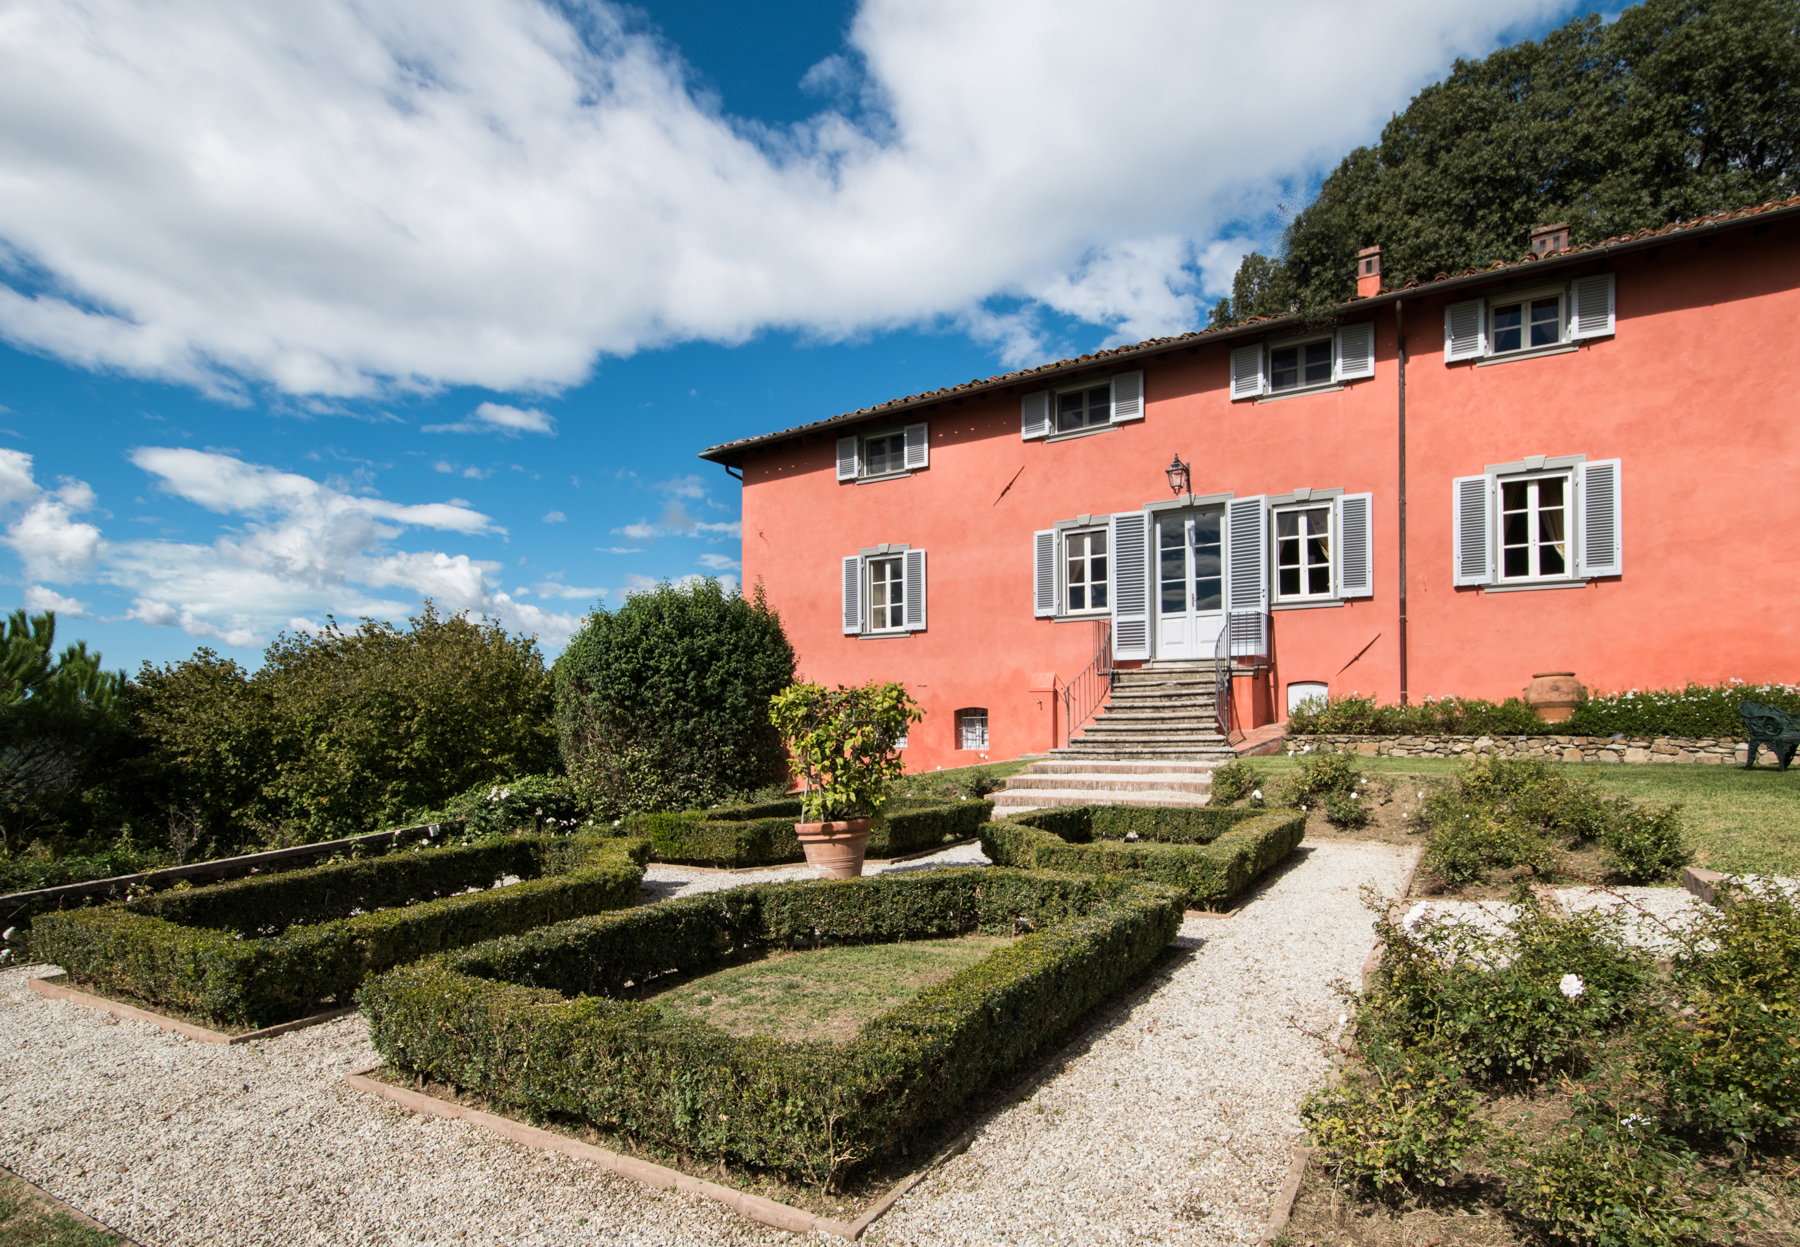 Villa in Vendita a Lucca: 5 locali, 1065 mq - Foto 2